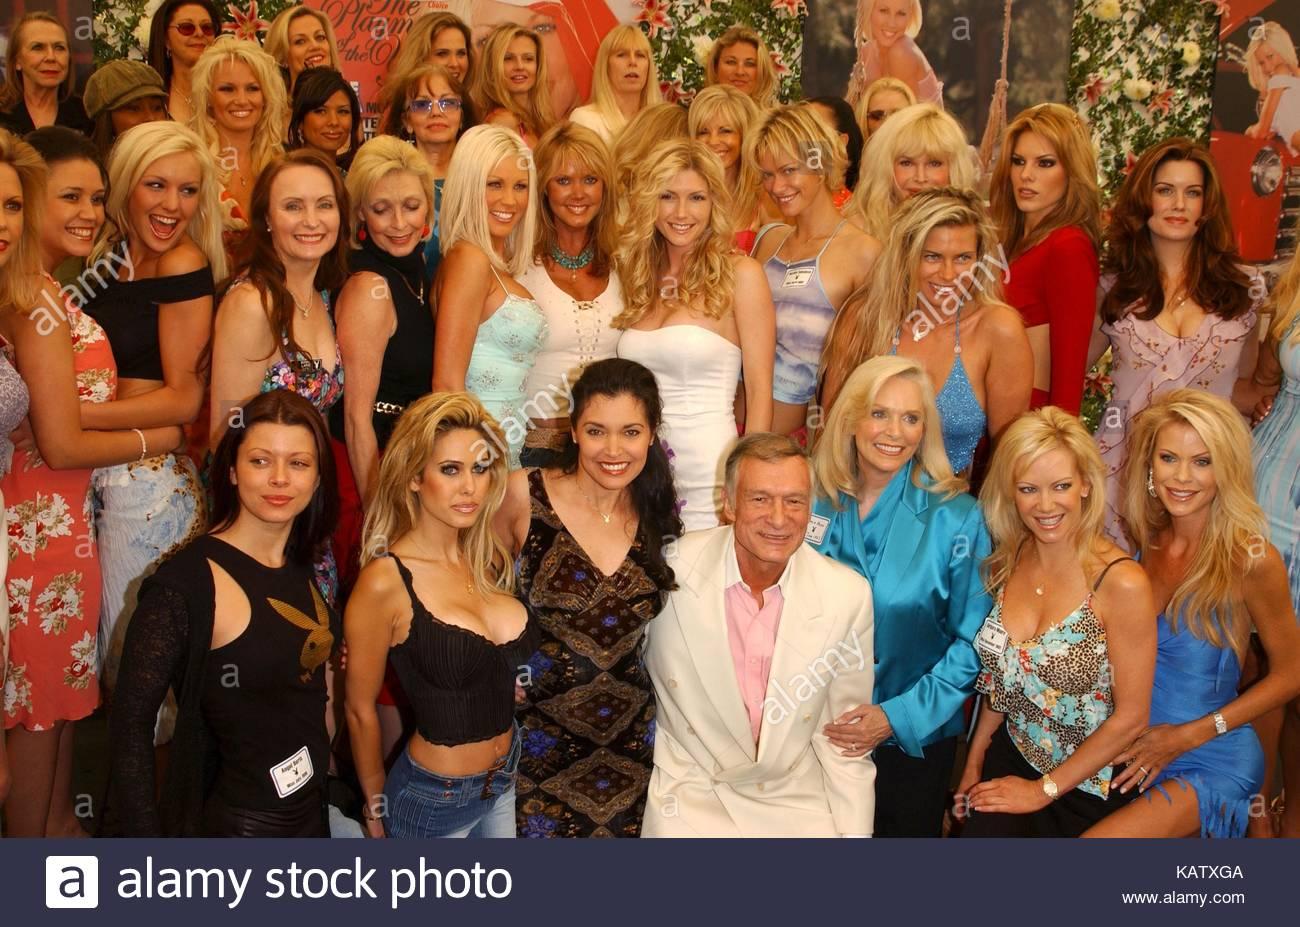 Playboy Mansion And Hugh Hefner Stock Photos & Playboy ...  Playboy Mansion...